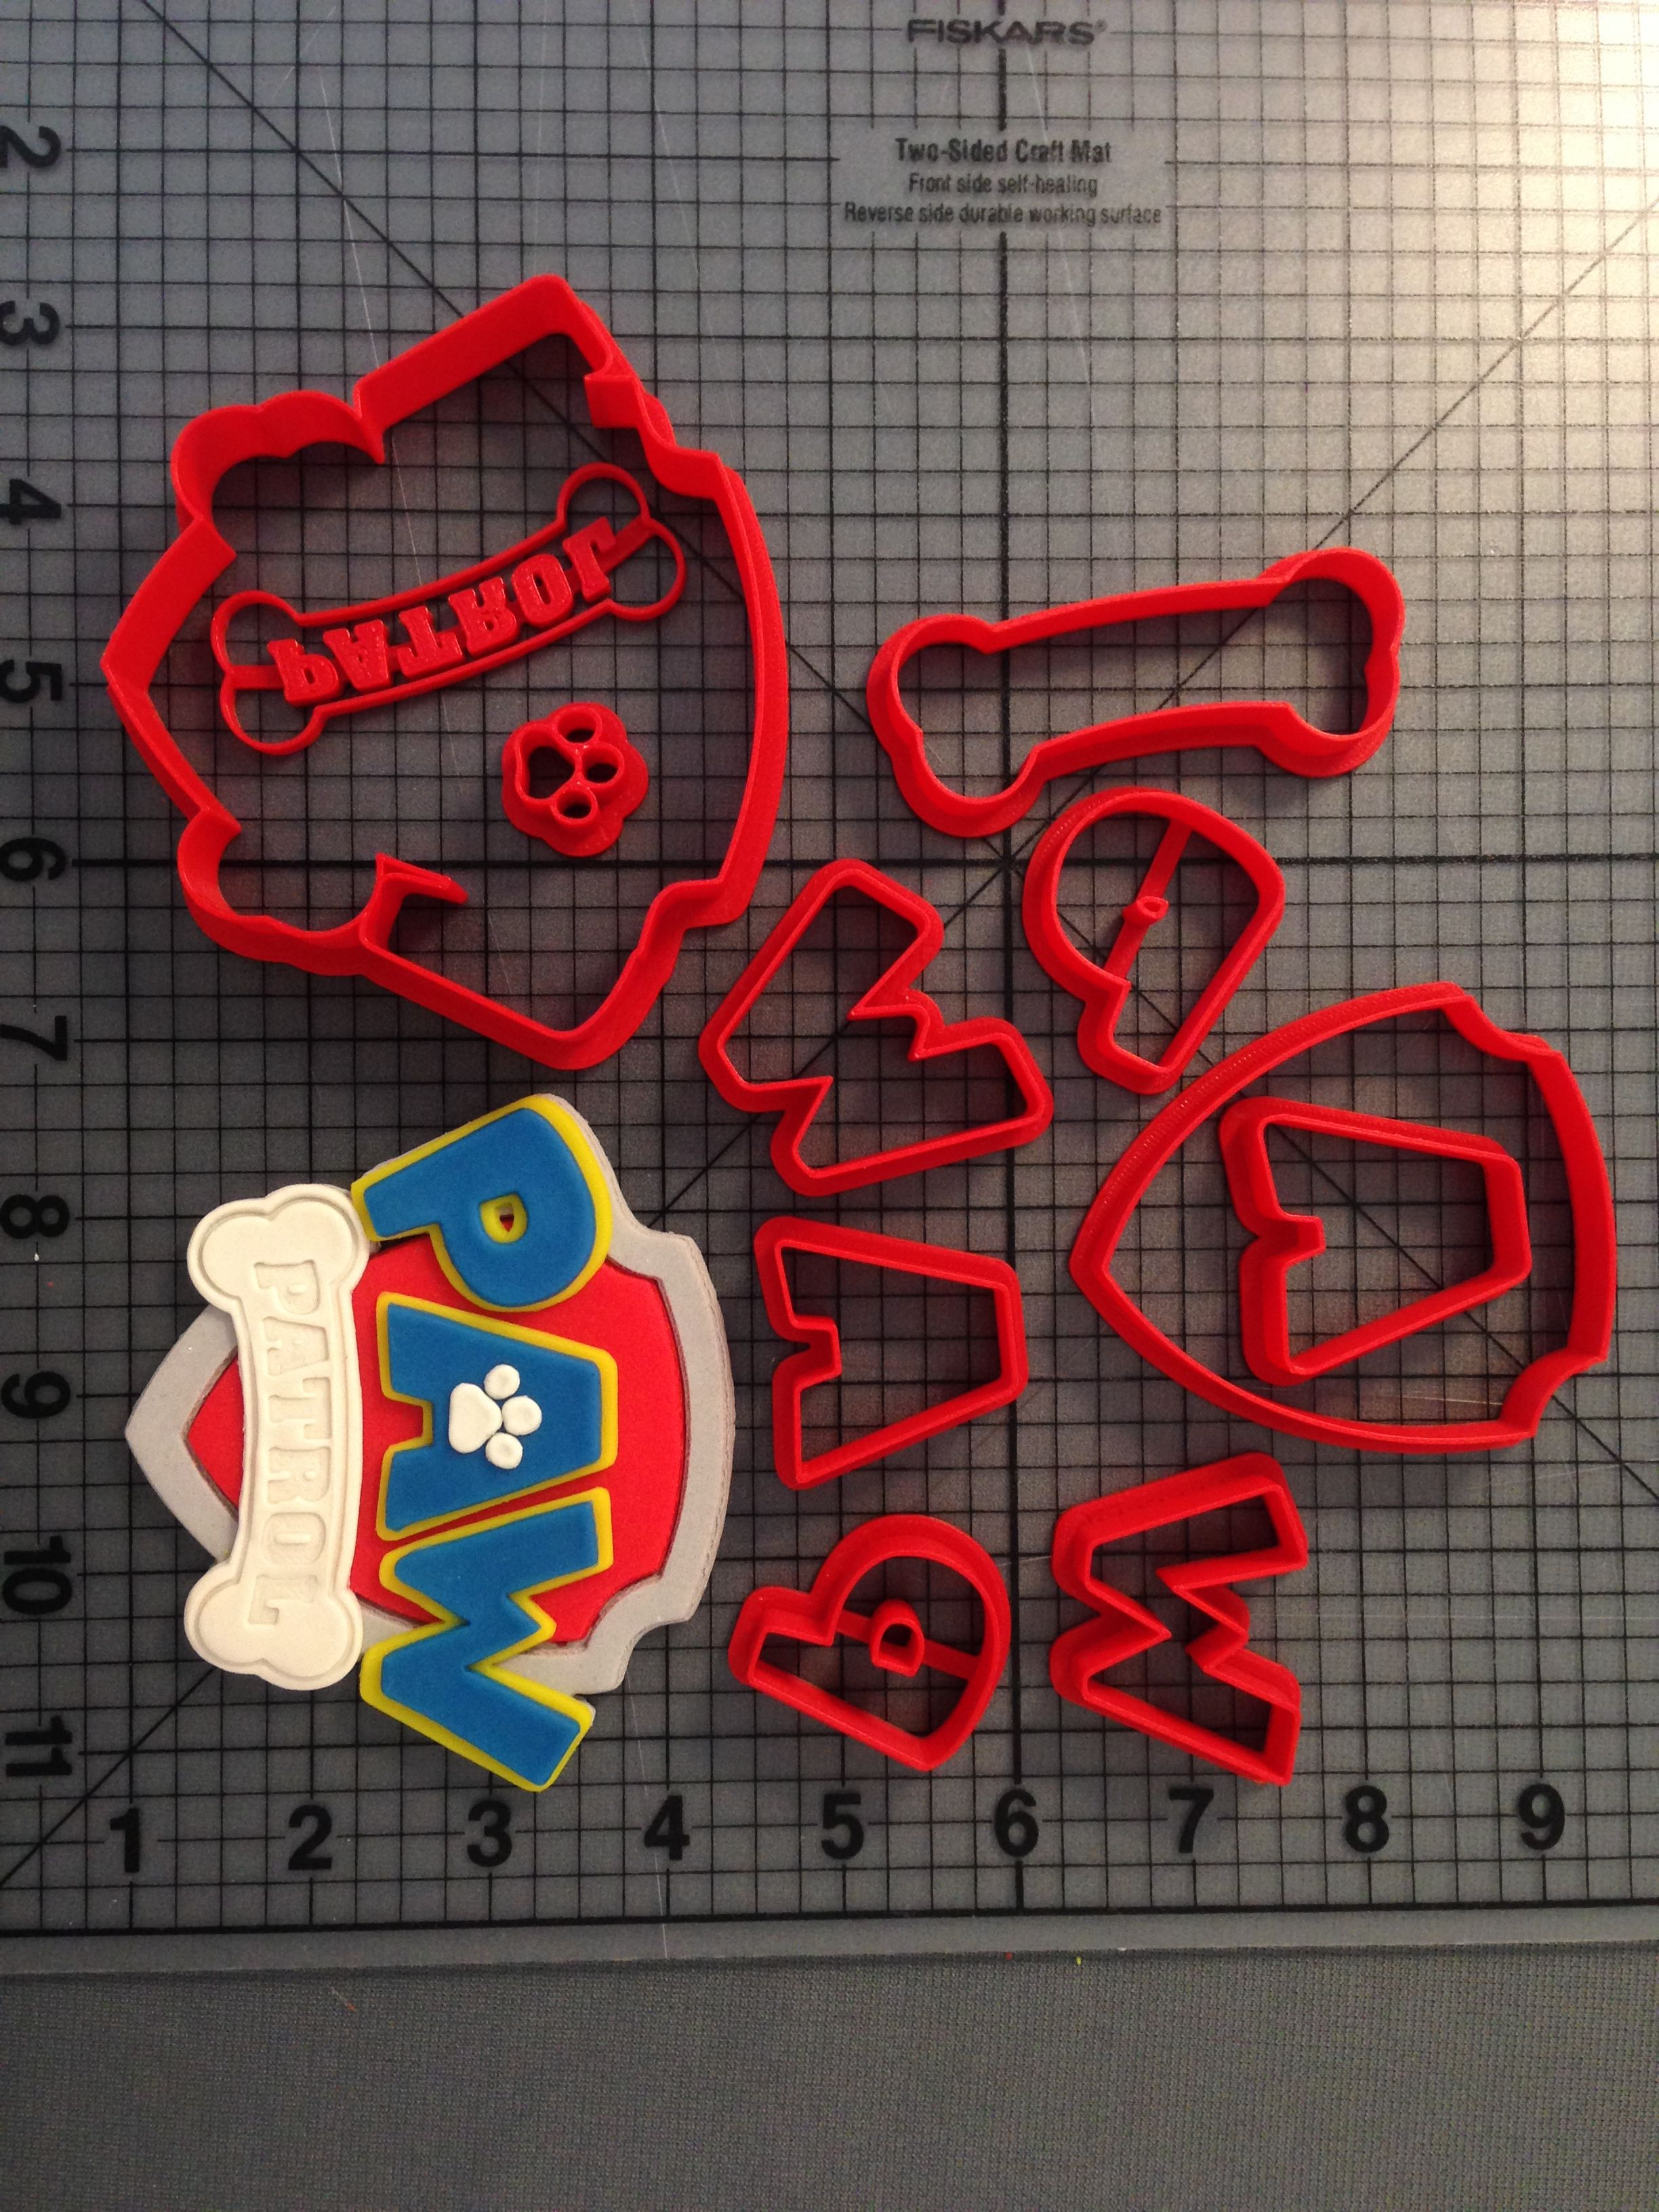 Paw Patrol Logo Emblem Cookie Cutter Stamp Fondant Birthday Cake Mold Pastry Set